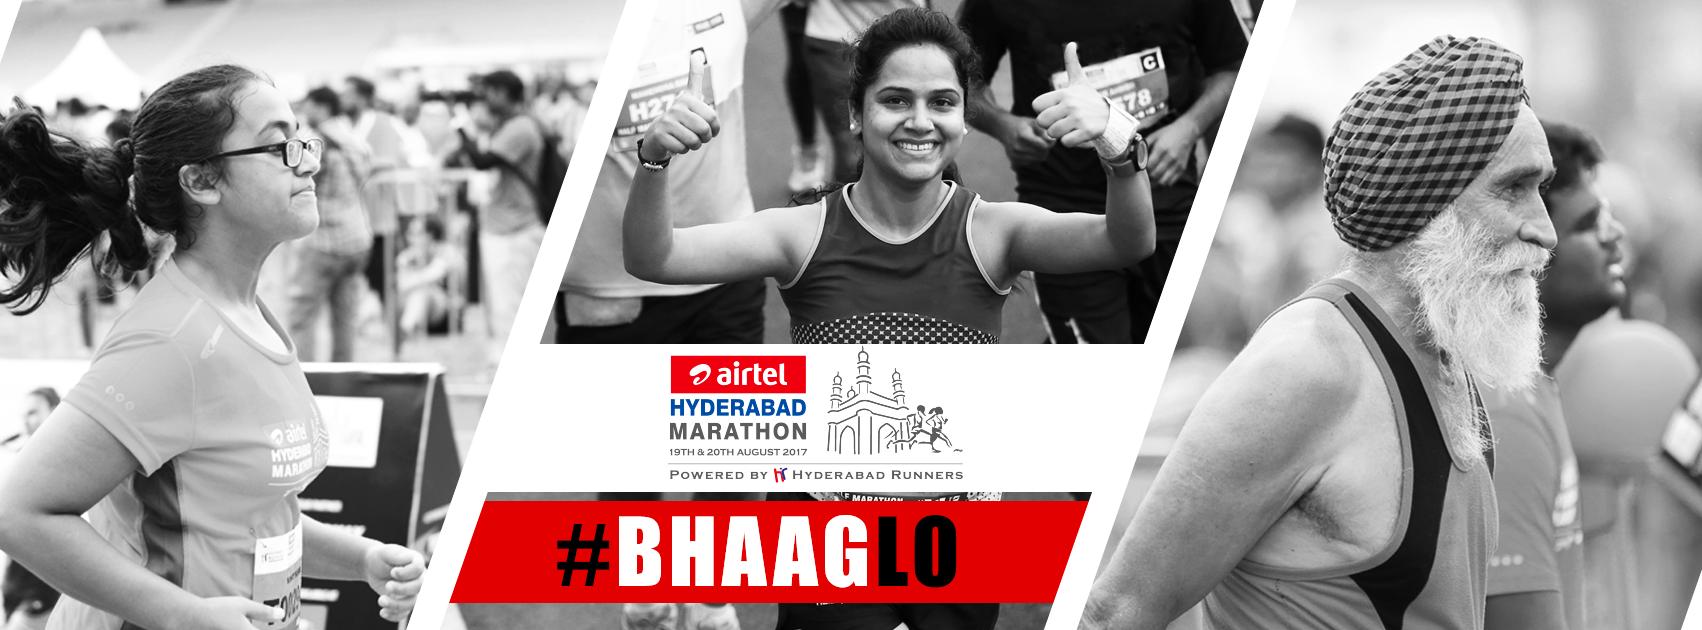 Airtel Hyderabad Marathon's 5K Fun Run